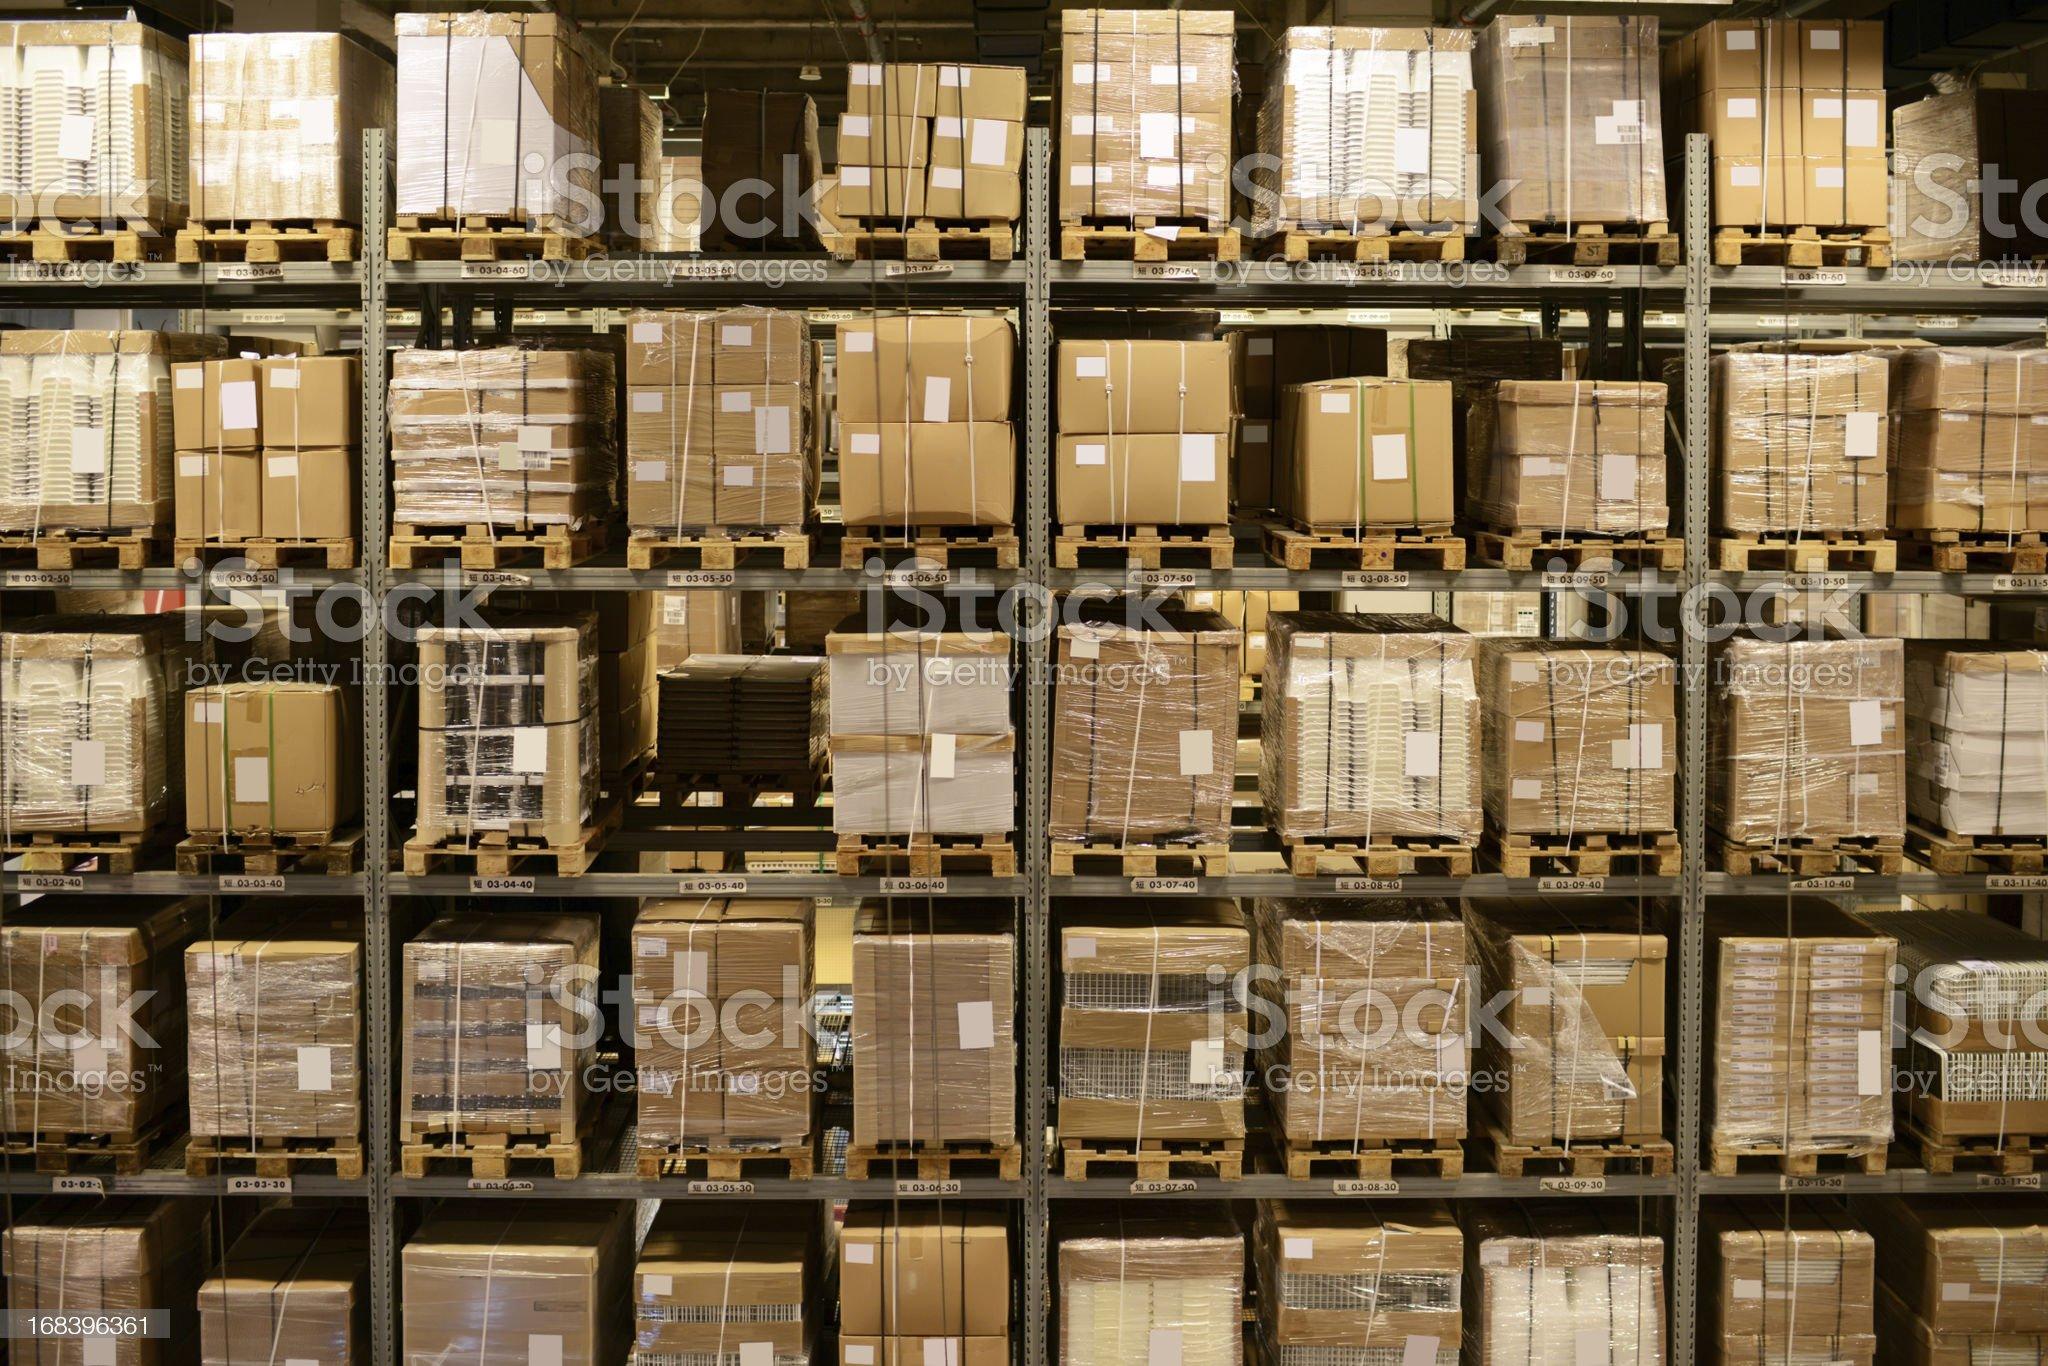 Front View of Warehouse and Cargo Shelf - XXXXXLarge royalty-free stock photo